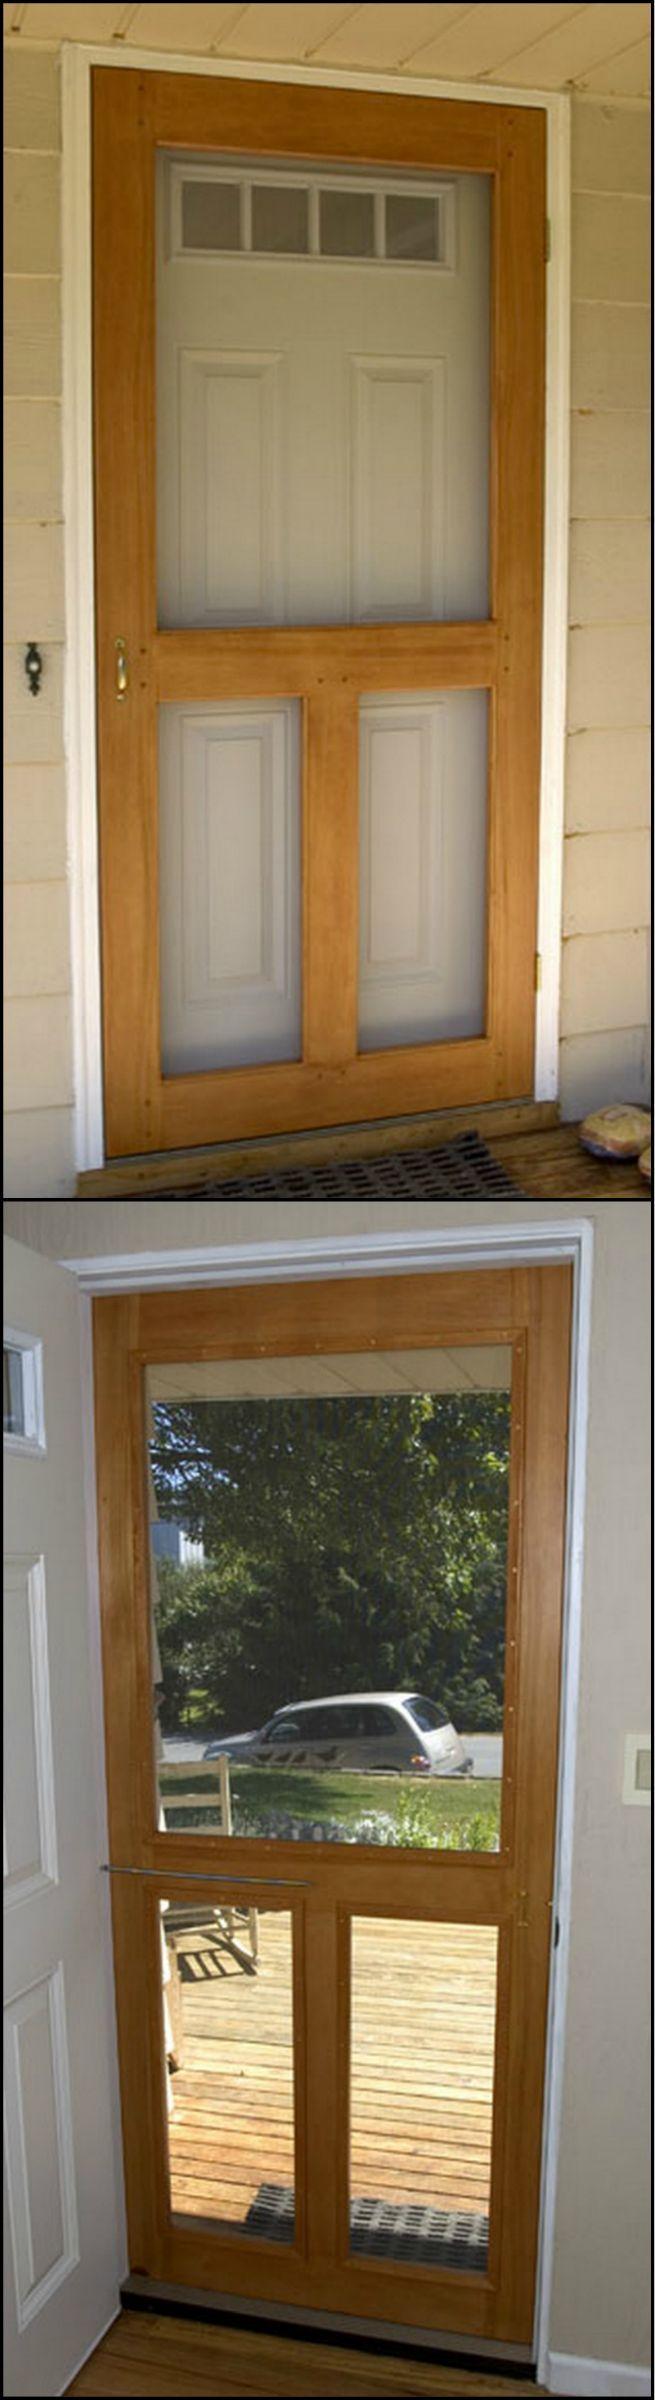 Pin By Blocks From The Heart On Front Porch Haus Fliegentür Türen